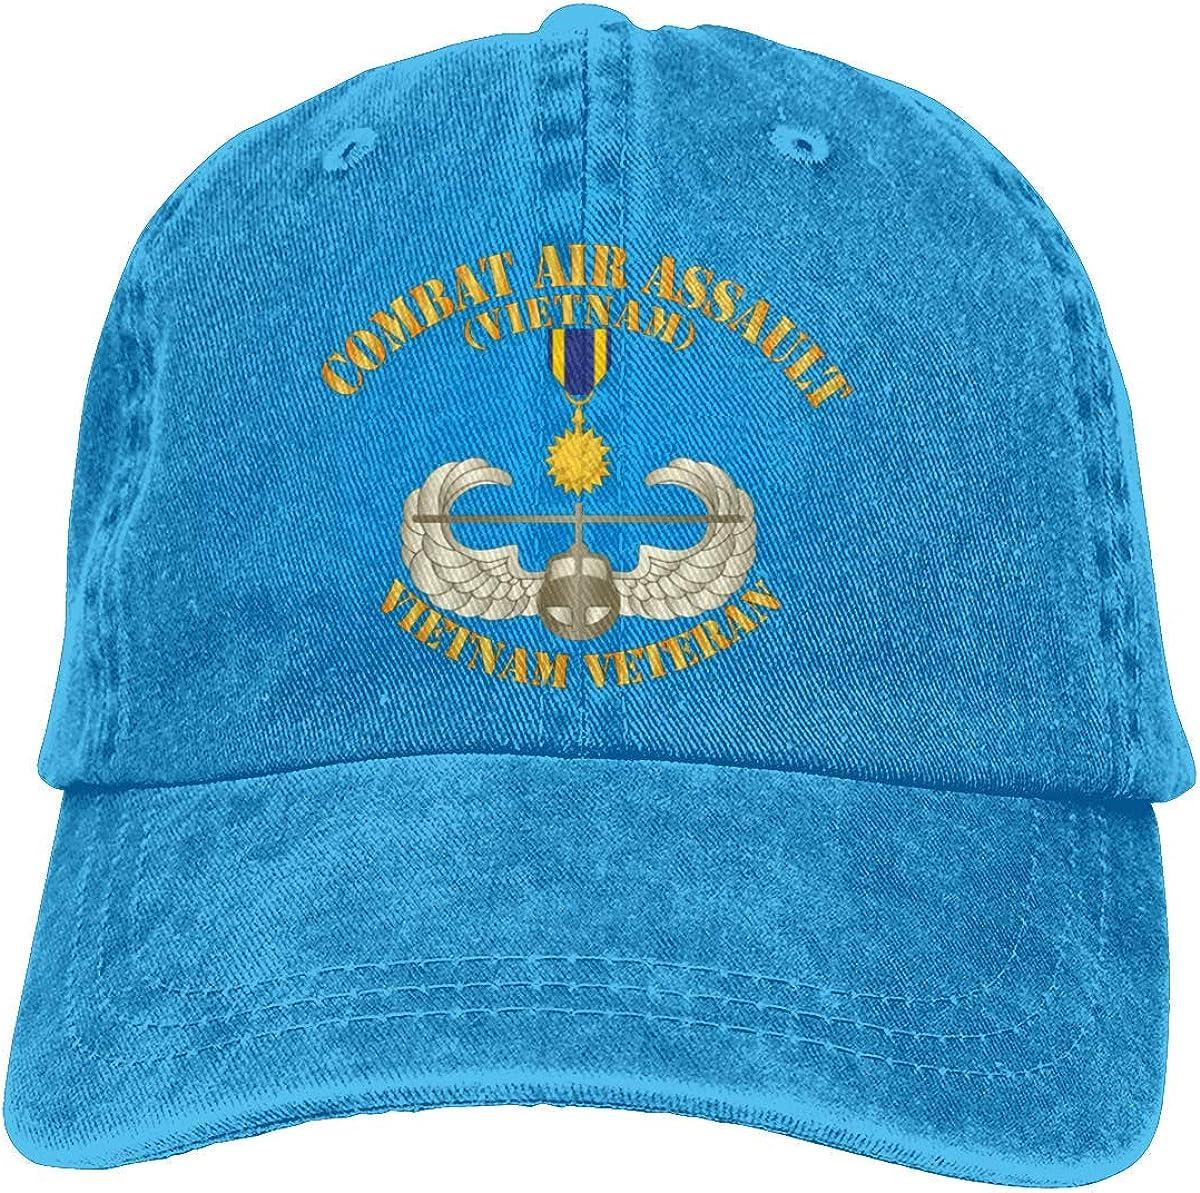 Combat Air Assault Vietnam W Air Medal Baseball Cap, Adjustable Size Dad Hat, Vintage Baseball Hats for Men Woman